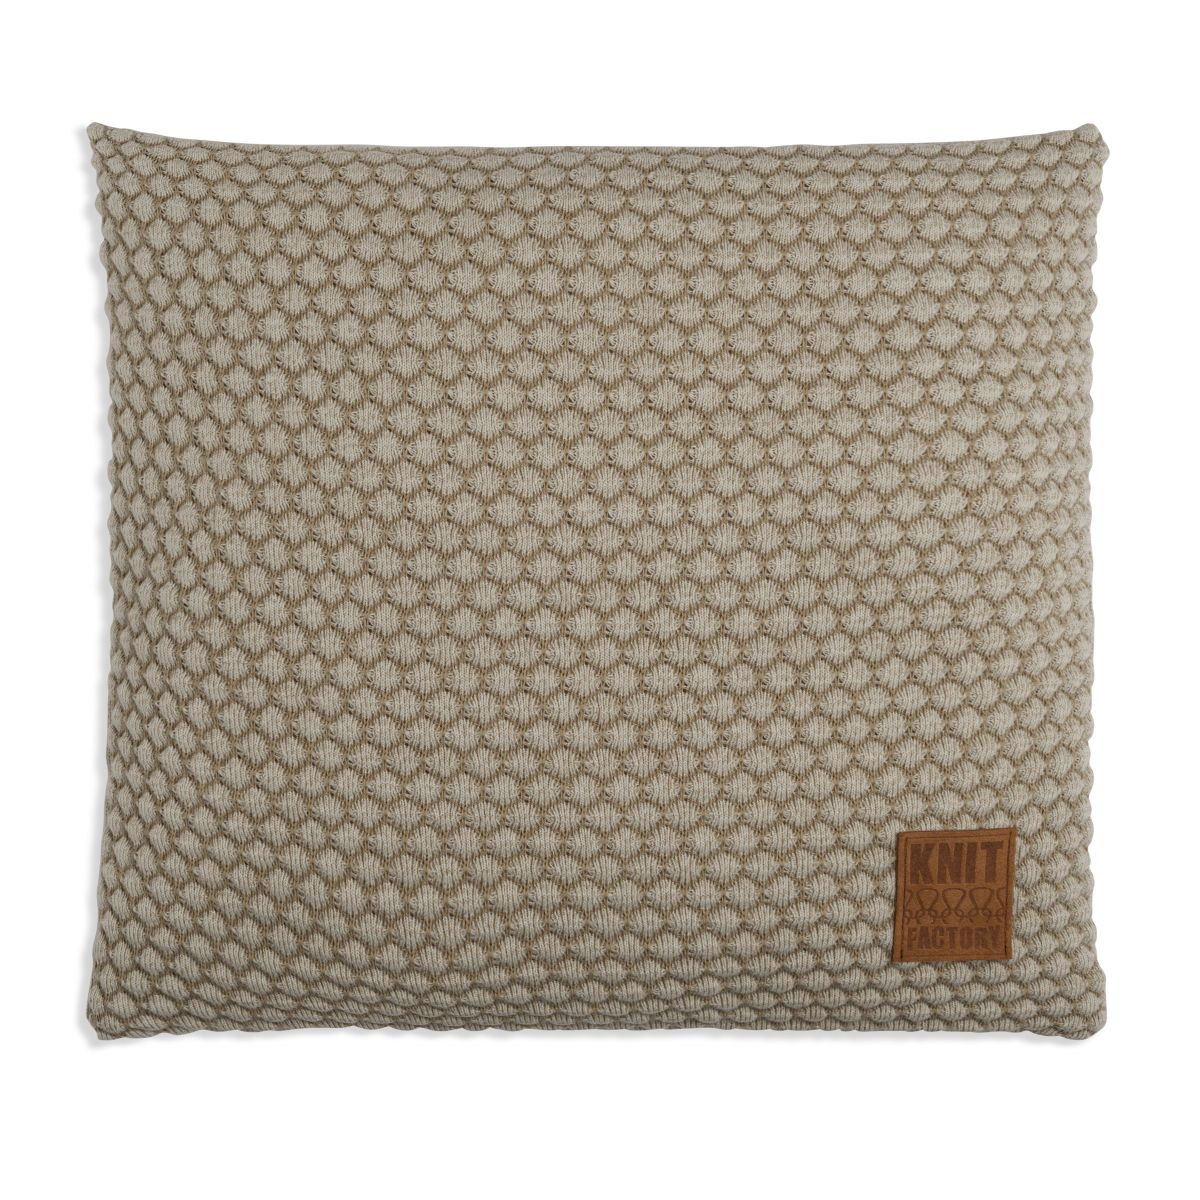 knit factory 1241257 kussen 50x50 juul seda olive 1